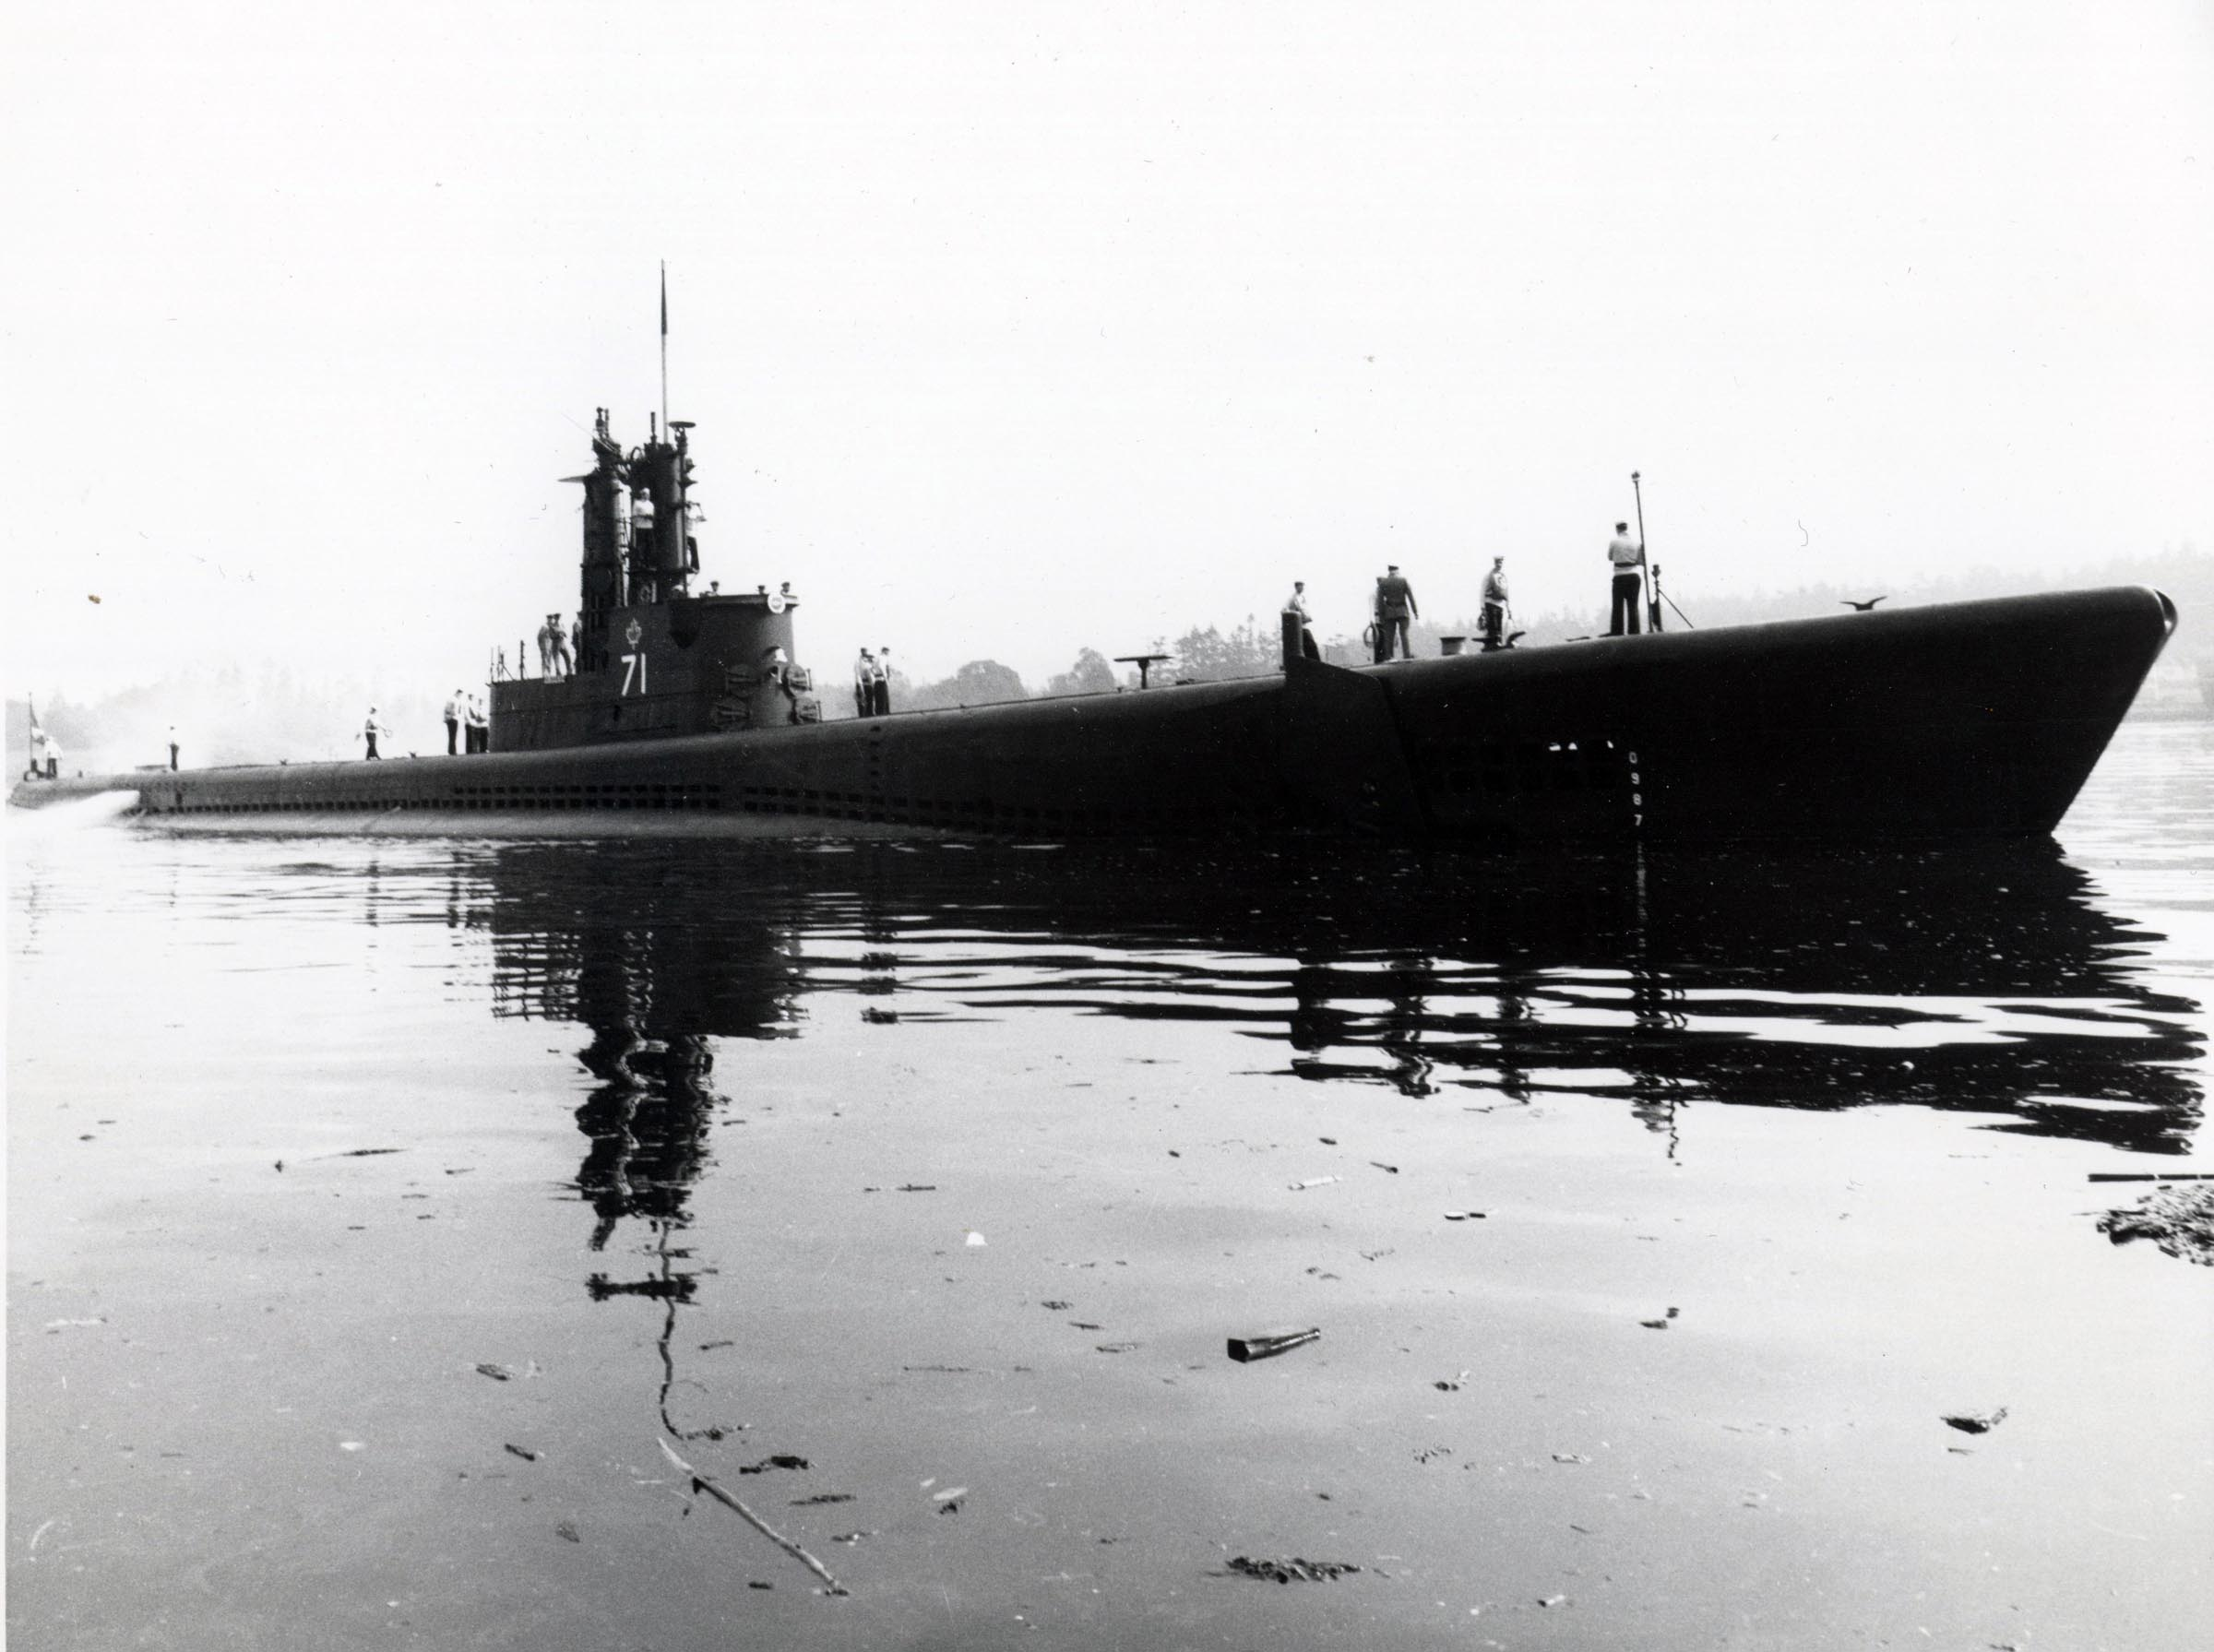 HMCS GRILSE (2nd)